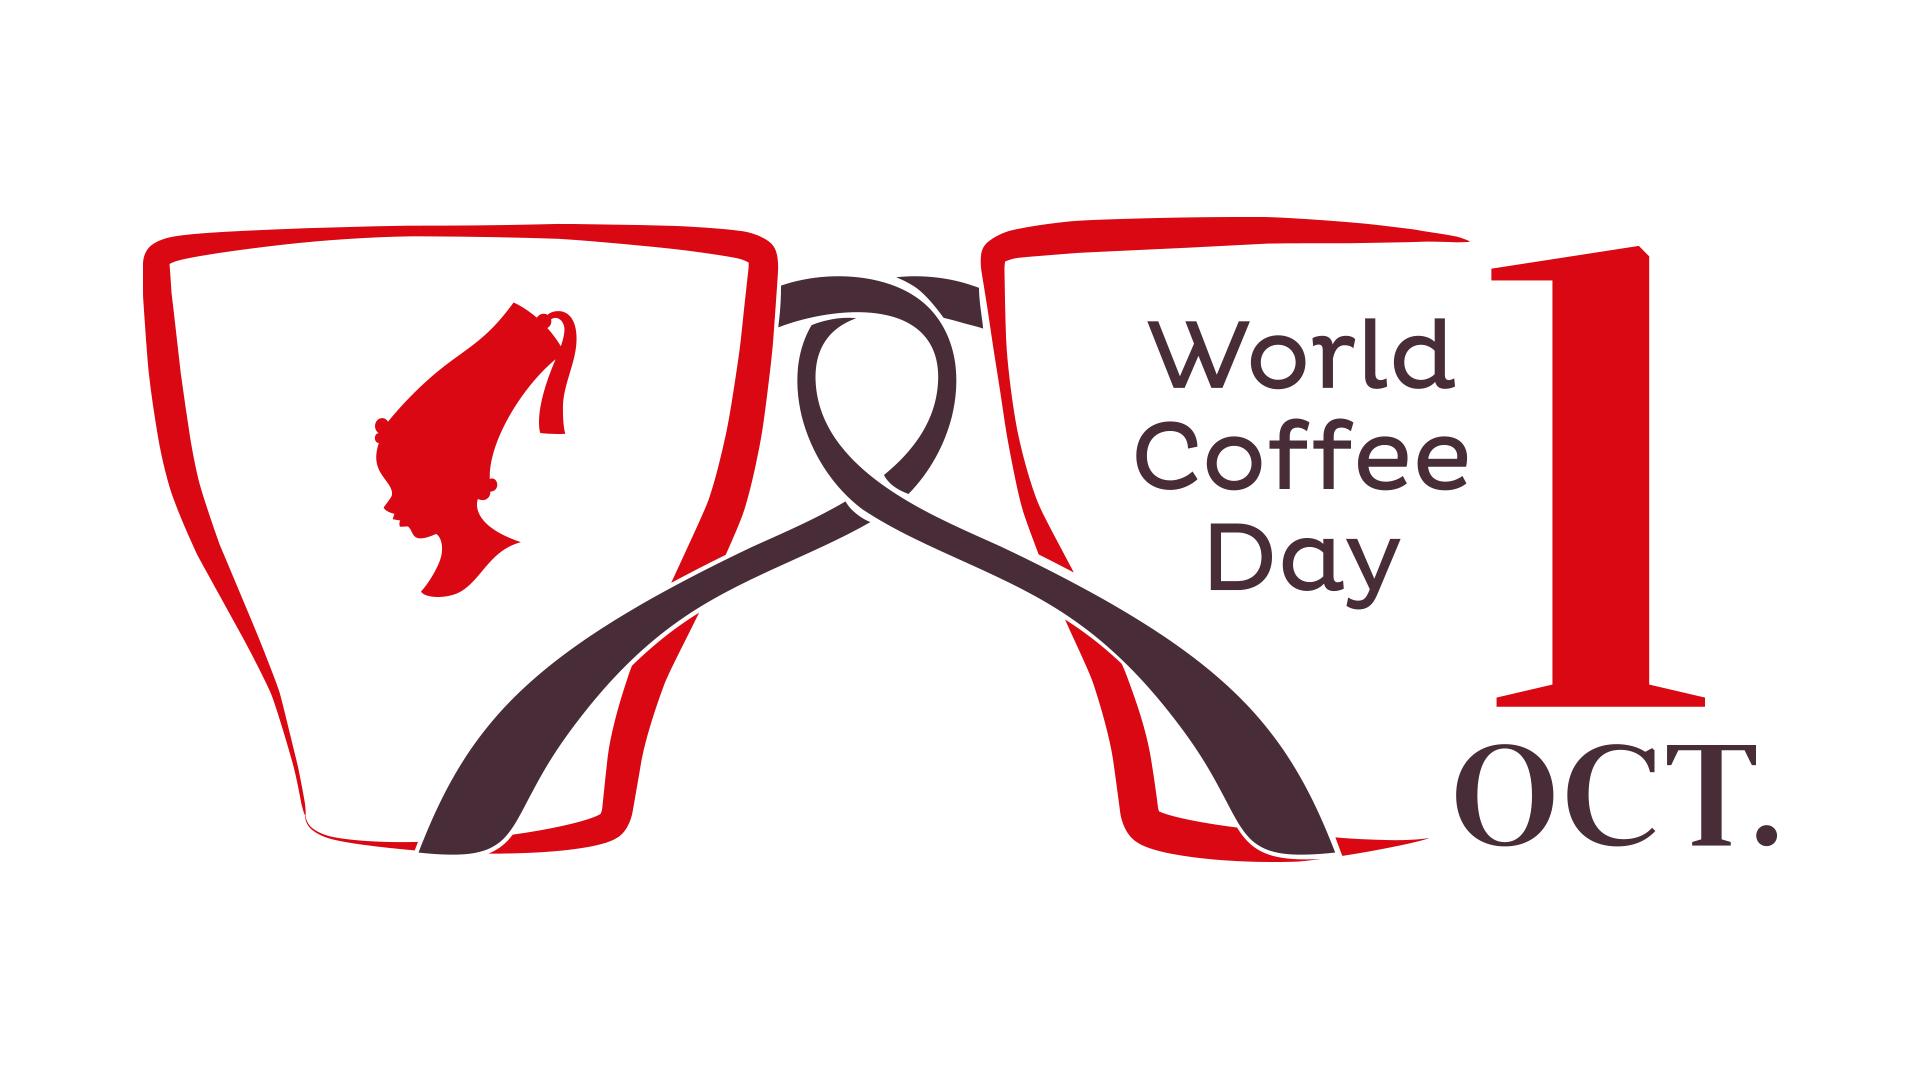 GRATIS Julius Meinl Kaffee - weltweit - am 1.10.2019